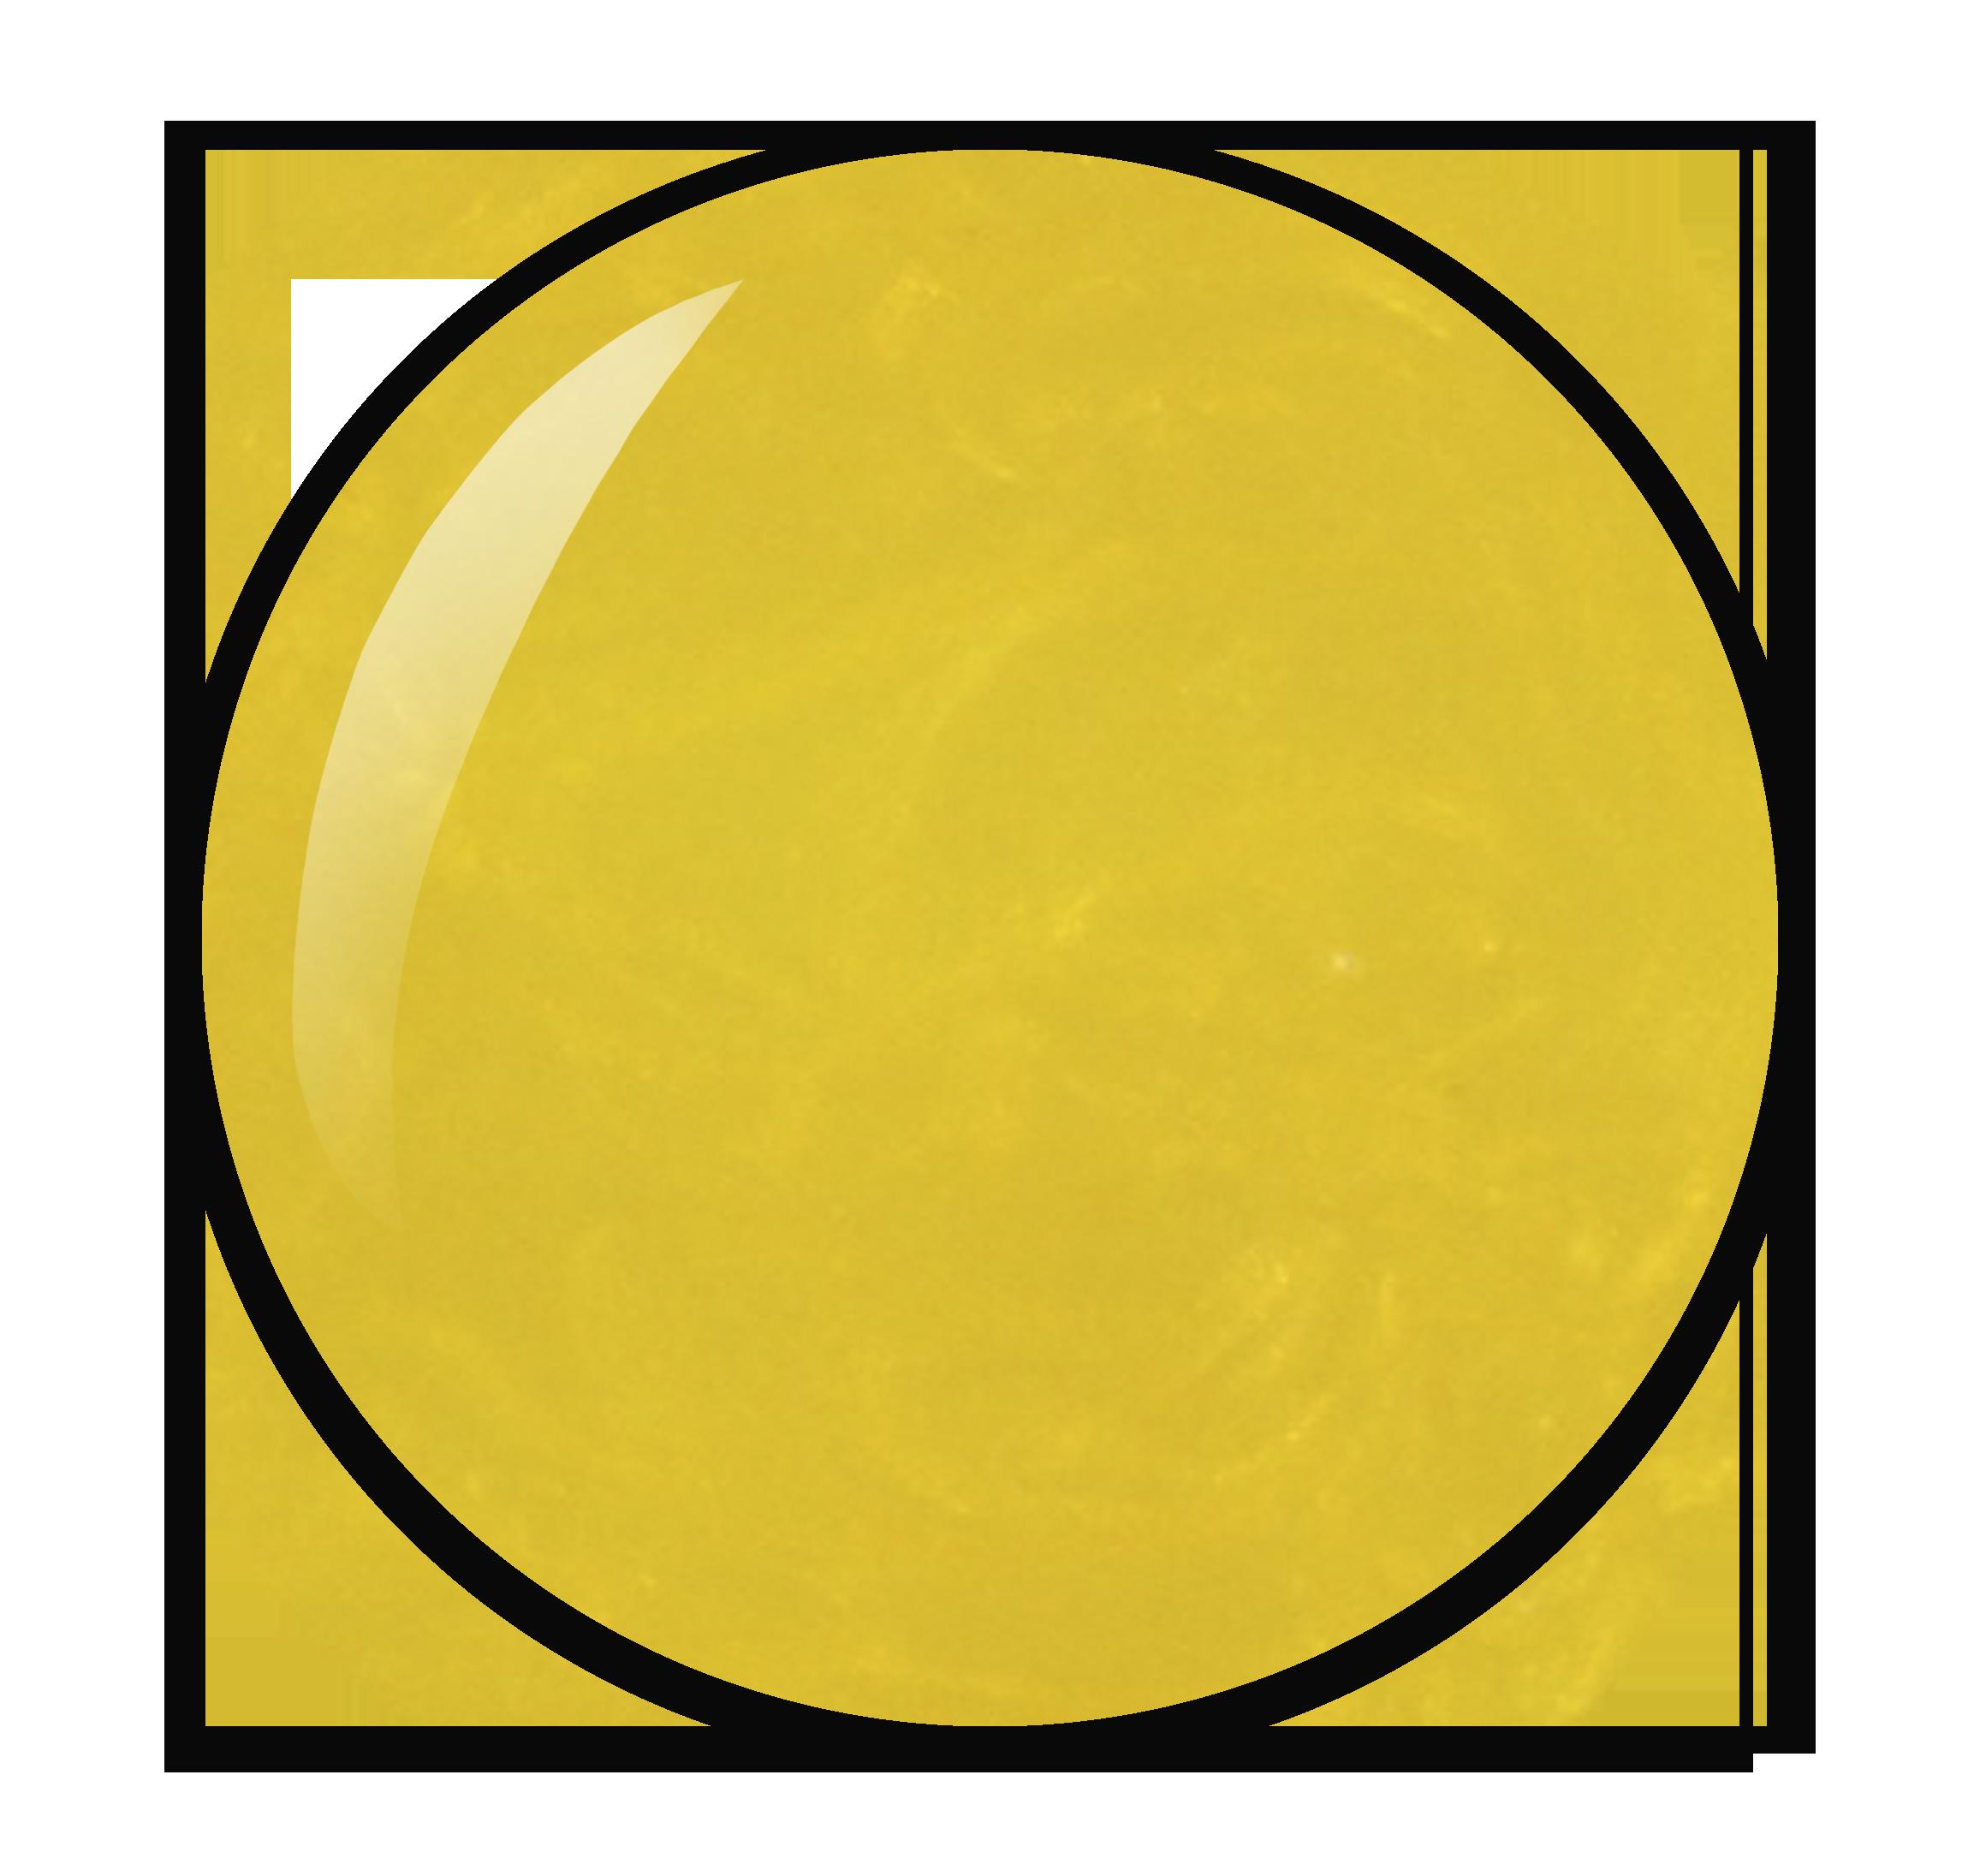 Gele nagellak kleurnummer 64 uit Herôme nagellak collectie